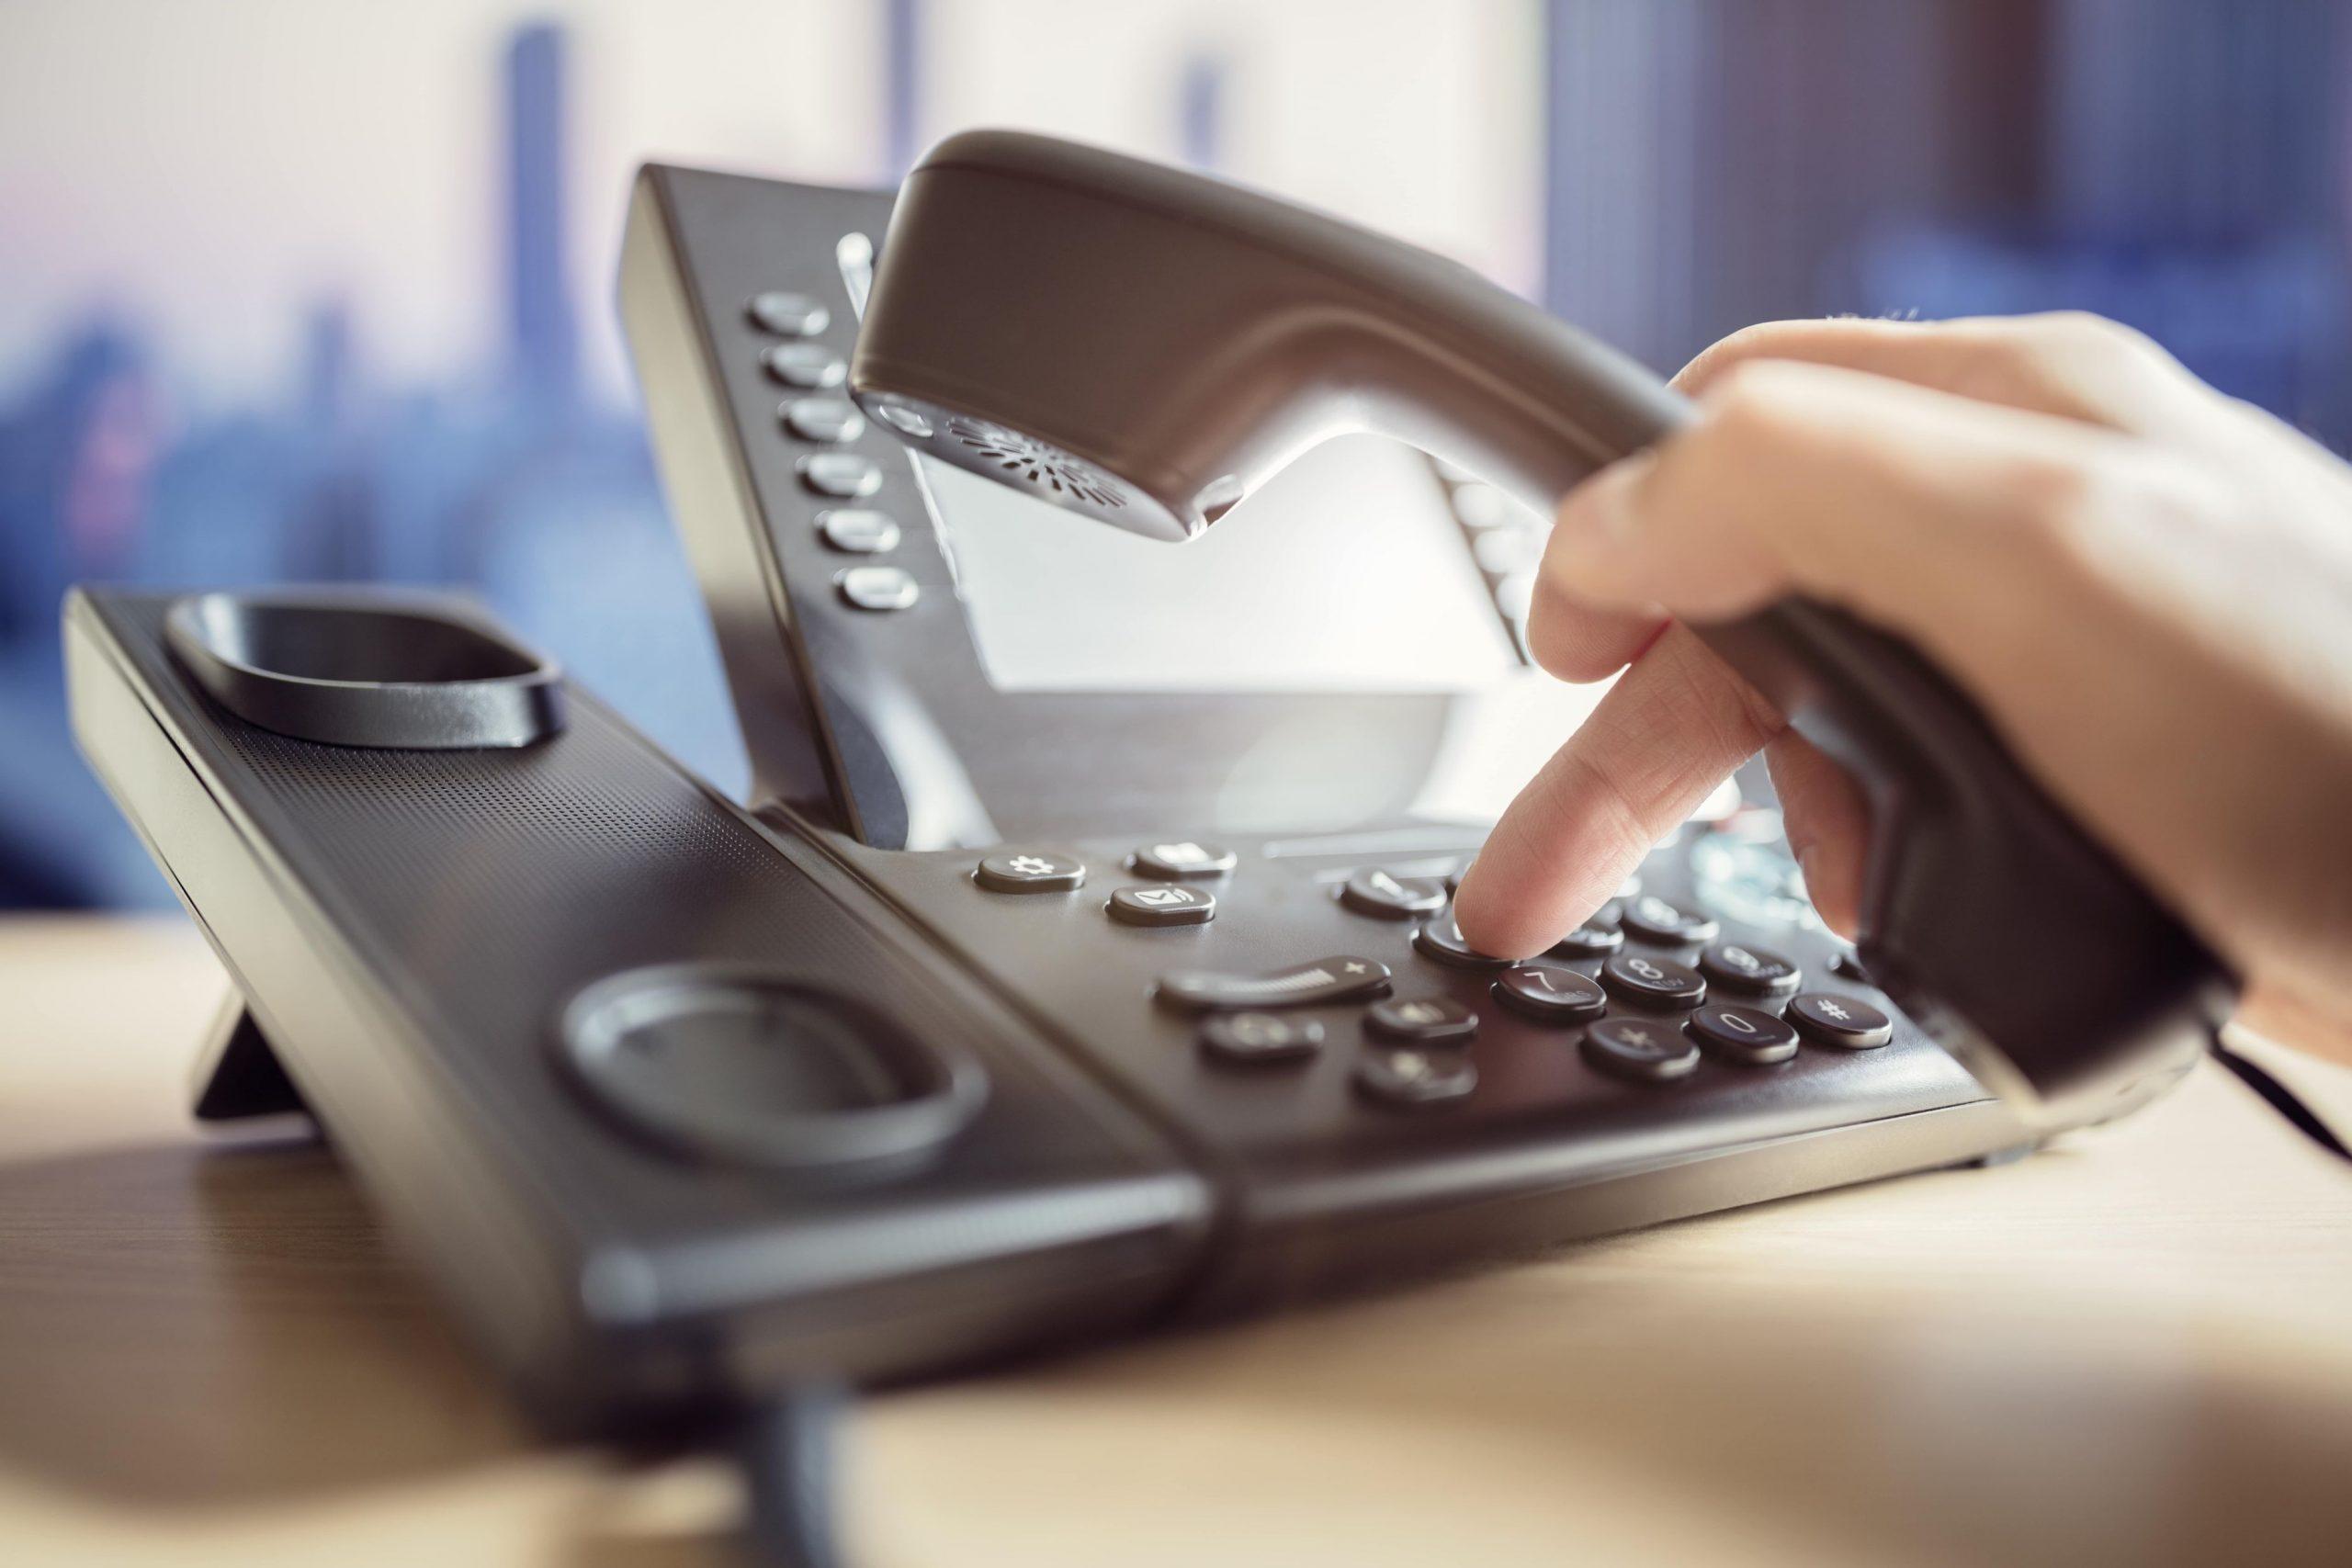 dialing-telephone-keypad-P2R6J47-min-scaled